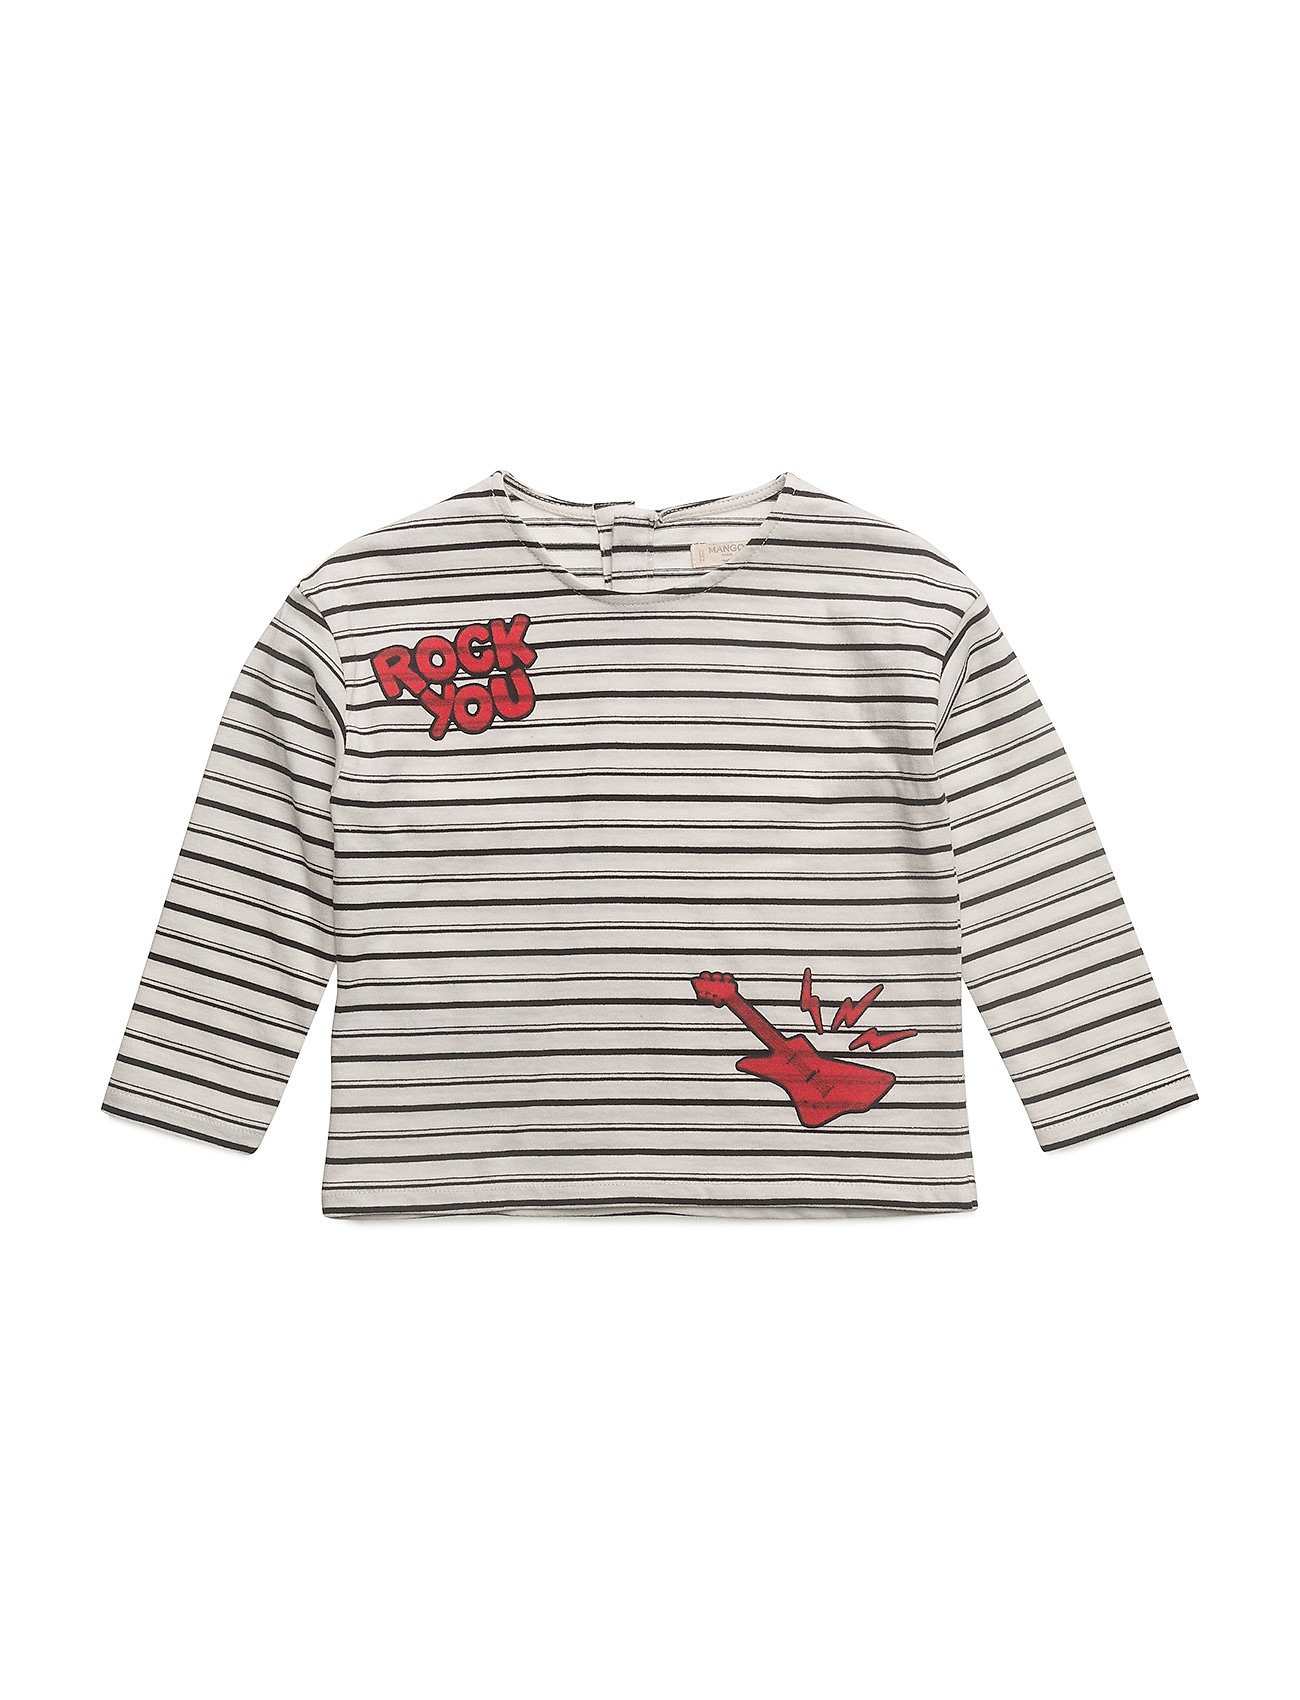 Mango Kids Printed striped t-shirt